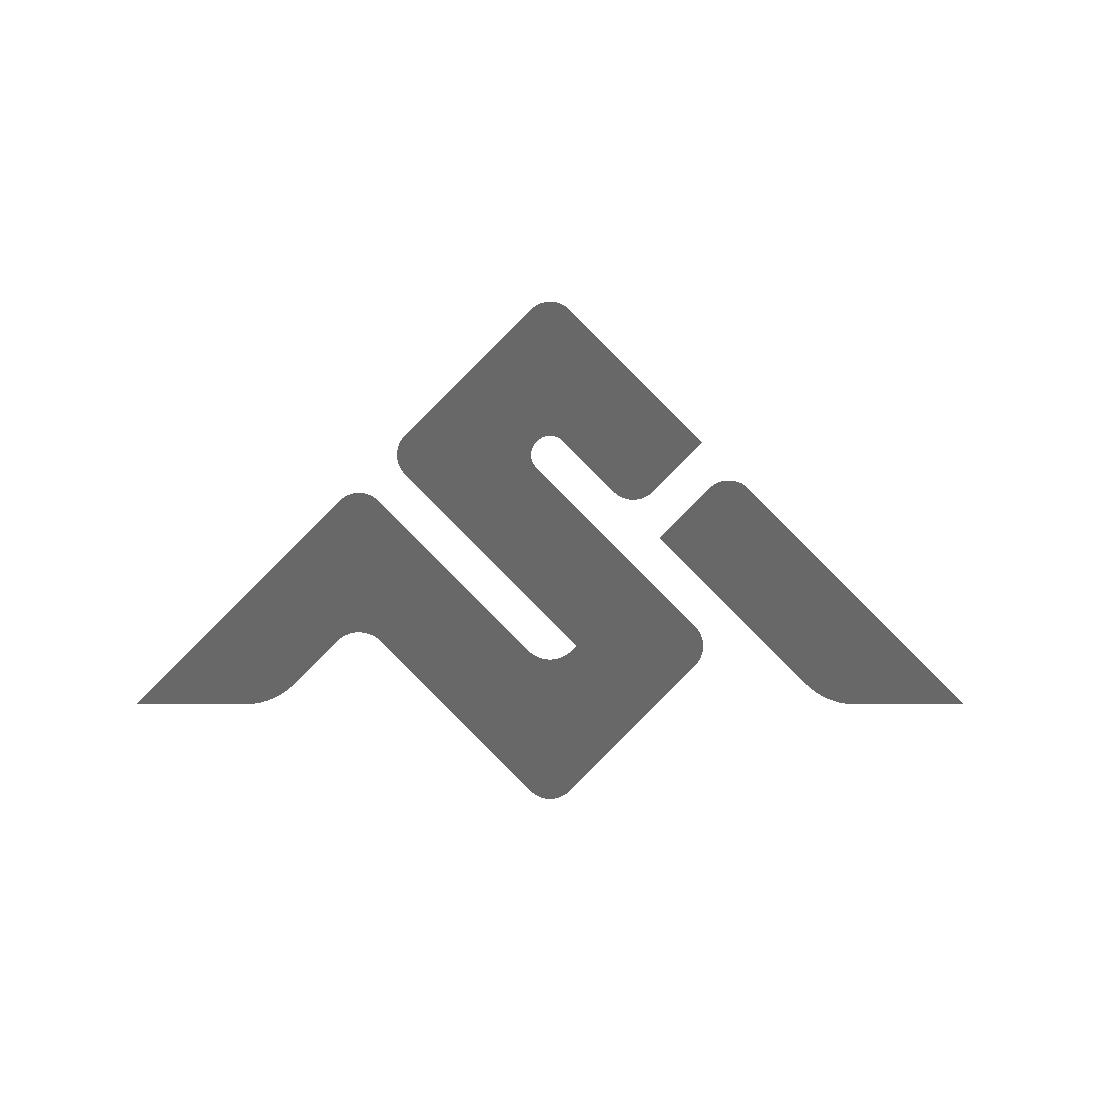 chaya billie jean roller skates pour femme achetez. Black Bedroom Furniture Sets. Home Design Ideas